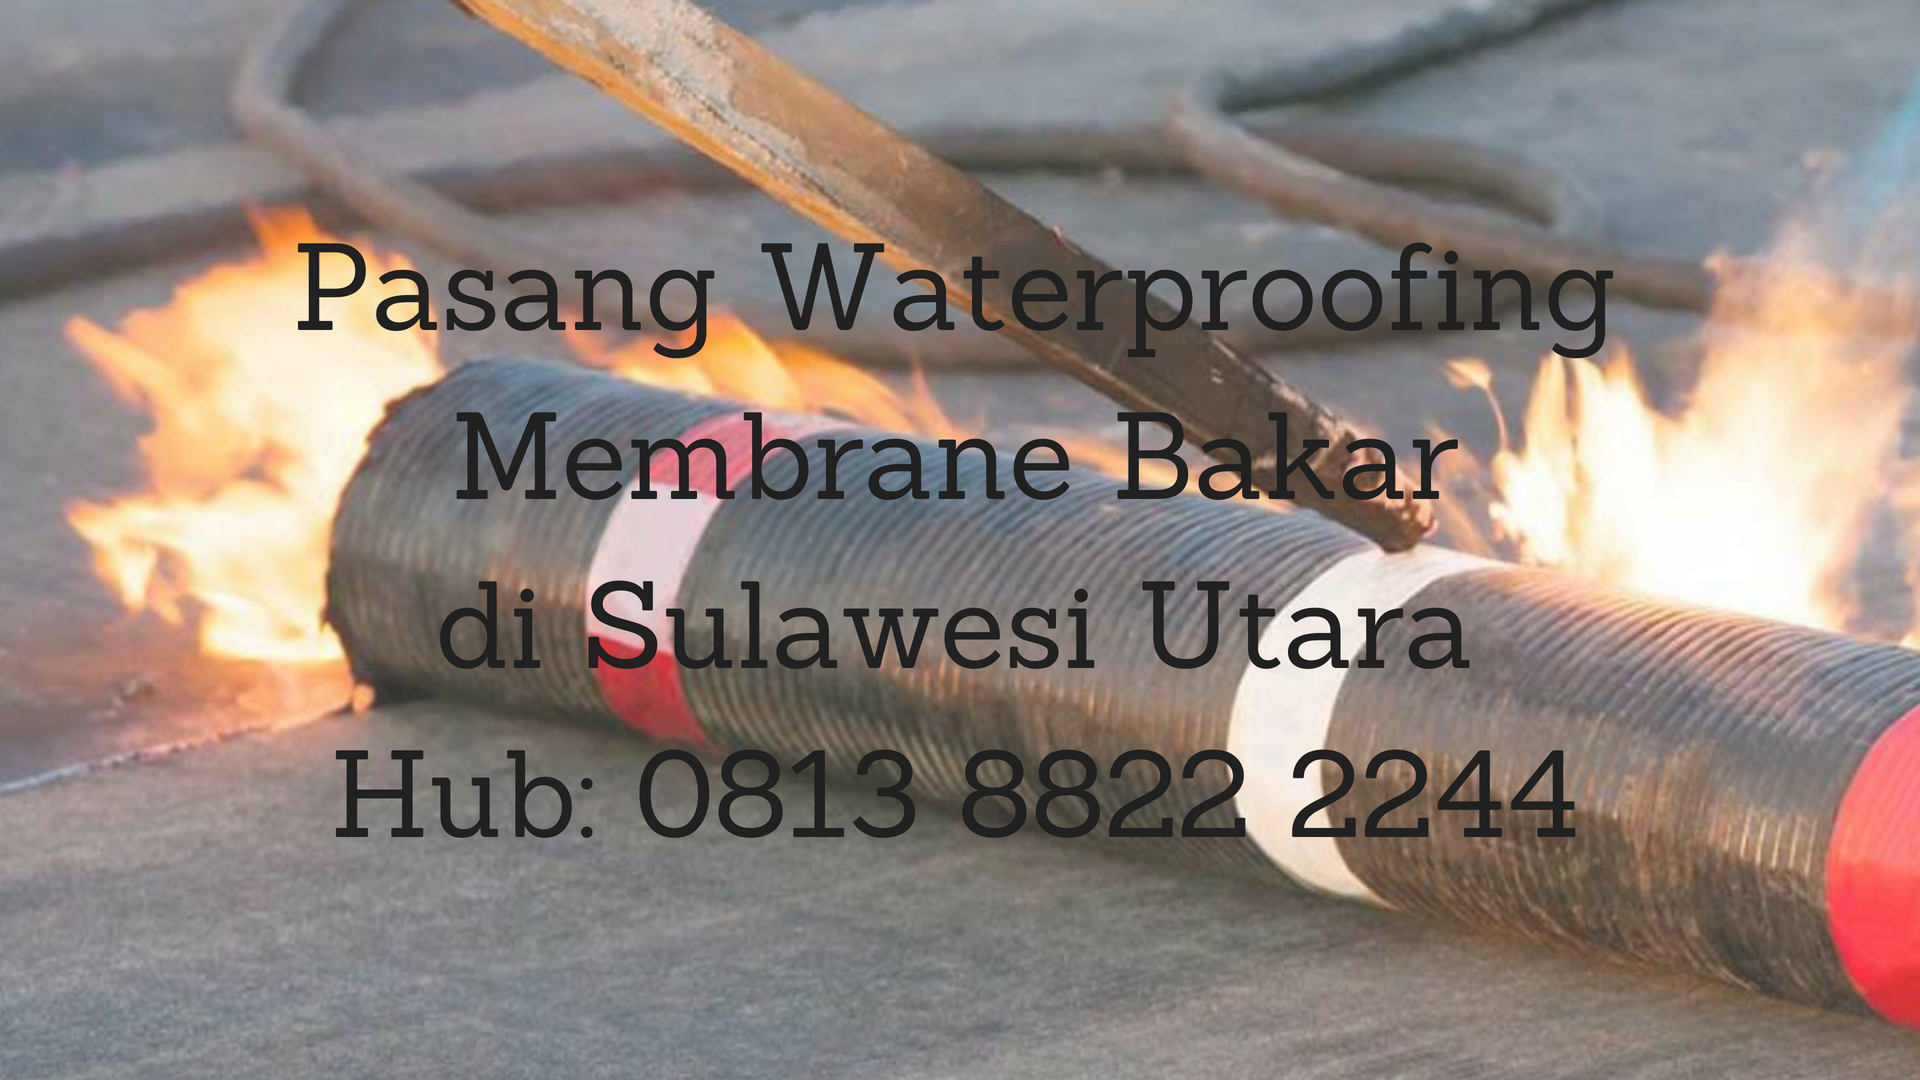 PASANG WATERPROOFING MEMBRANE BAKAR DI SULAWESI UTARA.  HUB : 0813 8822 2244